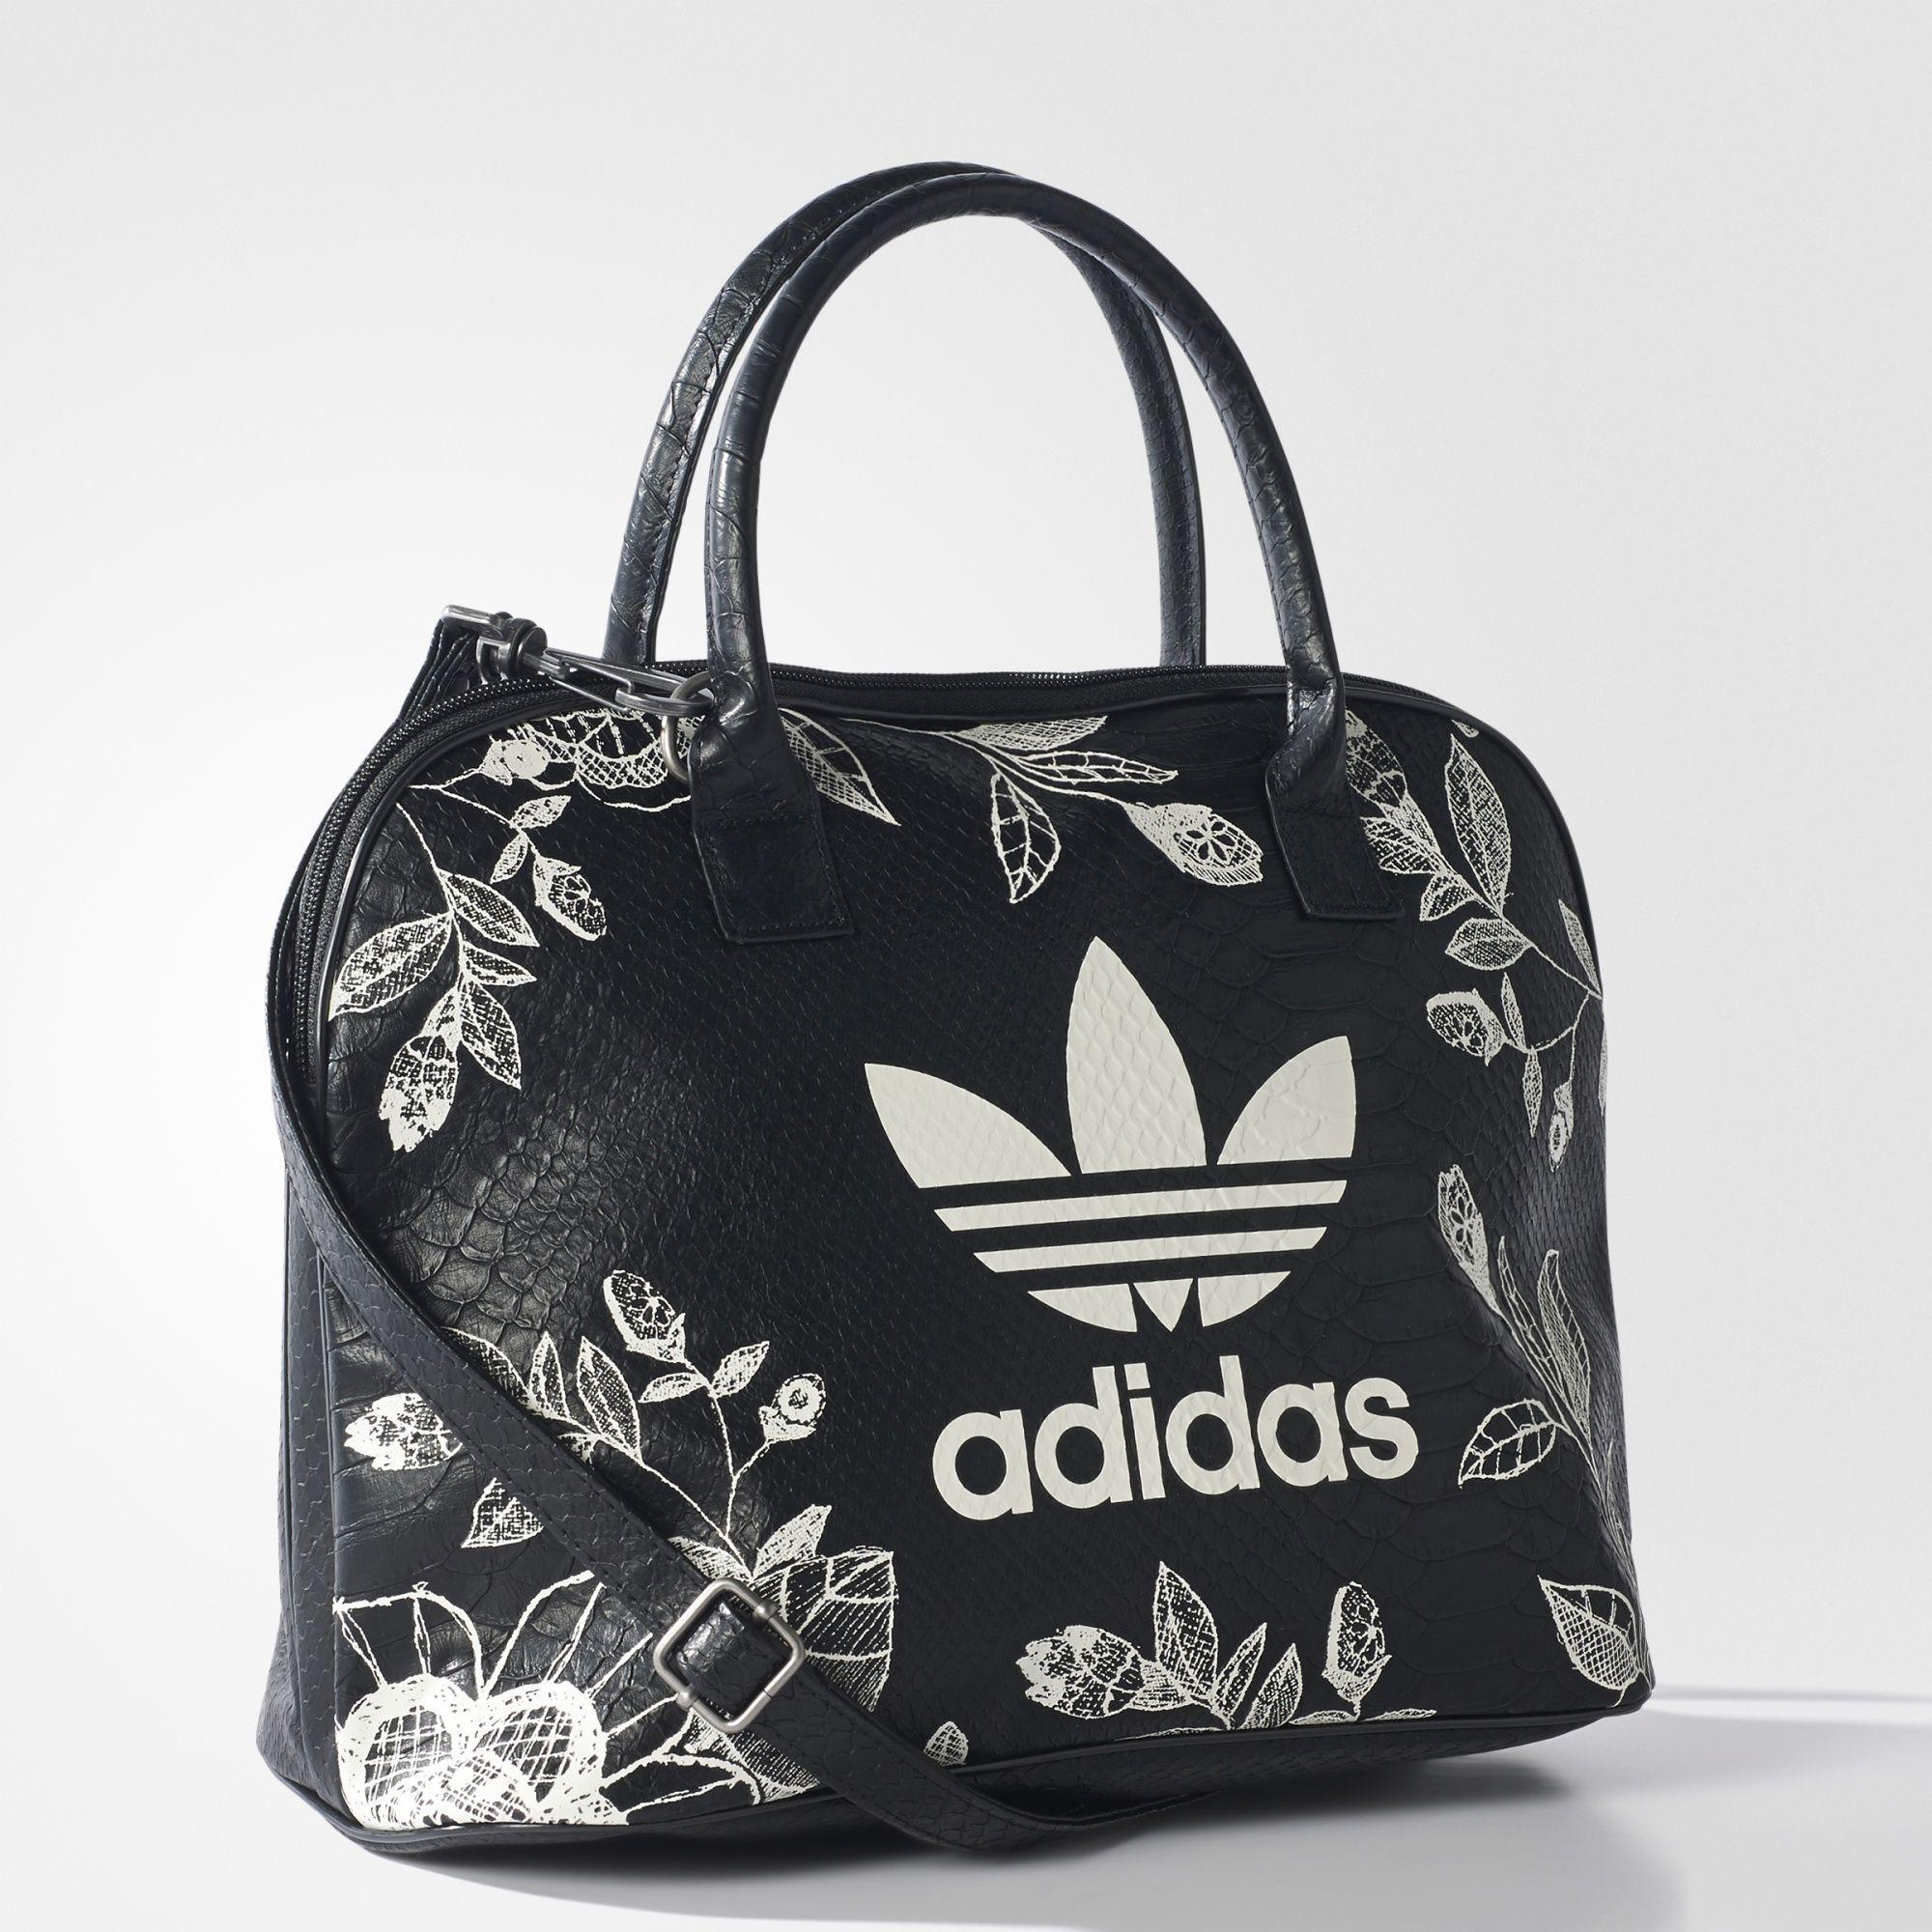 adidas Bolso Bowling Giza | bolsos mochilas y maletas en